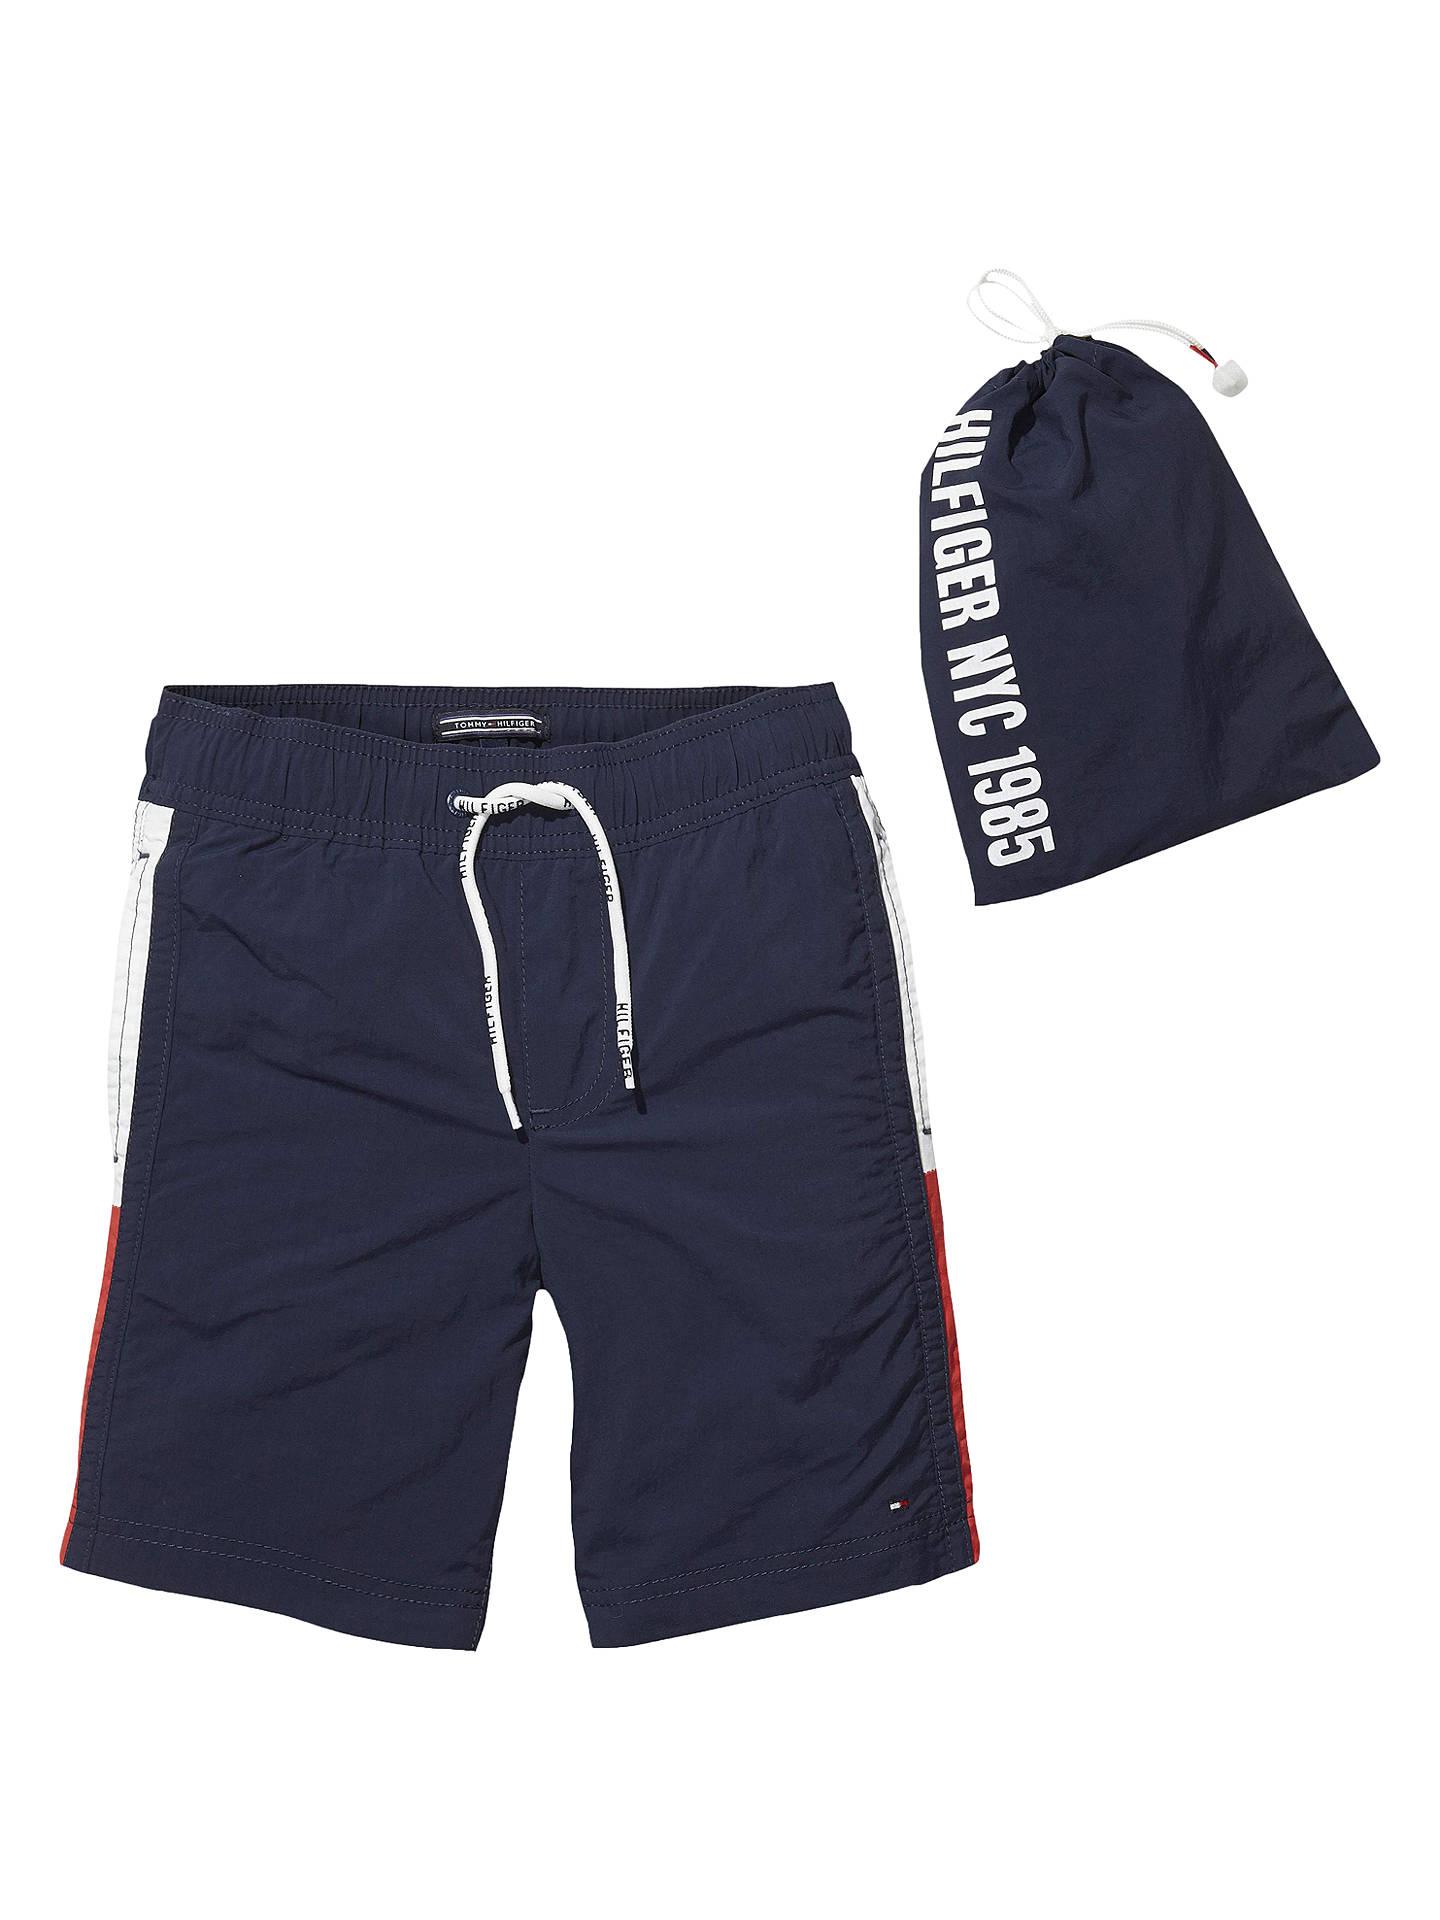 632fbea49 Buy Tommy Hilfiger Boys  Flag Swim Shorts